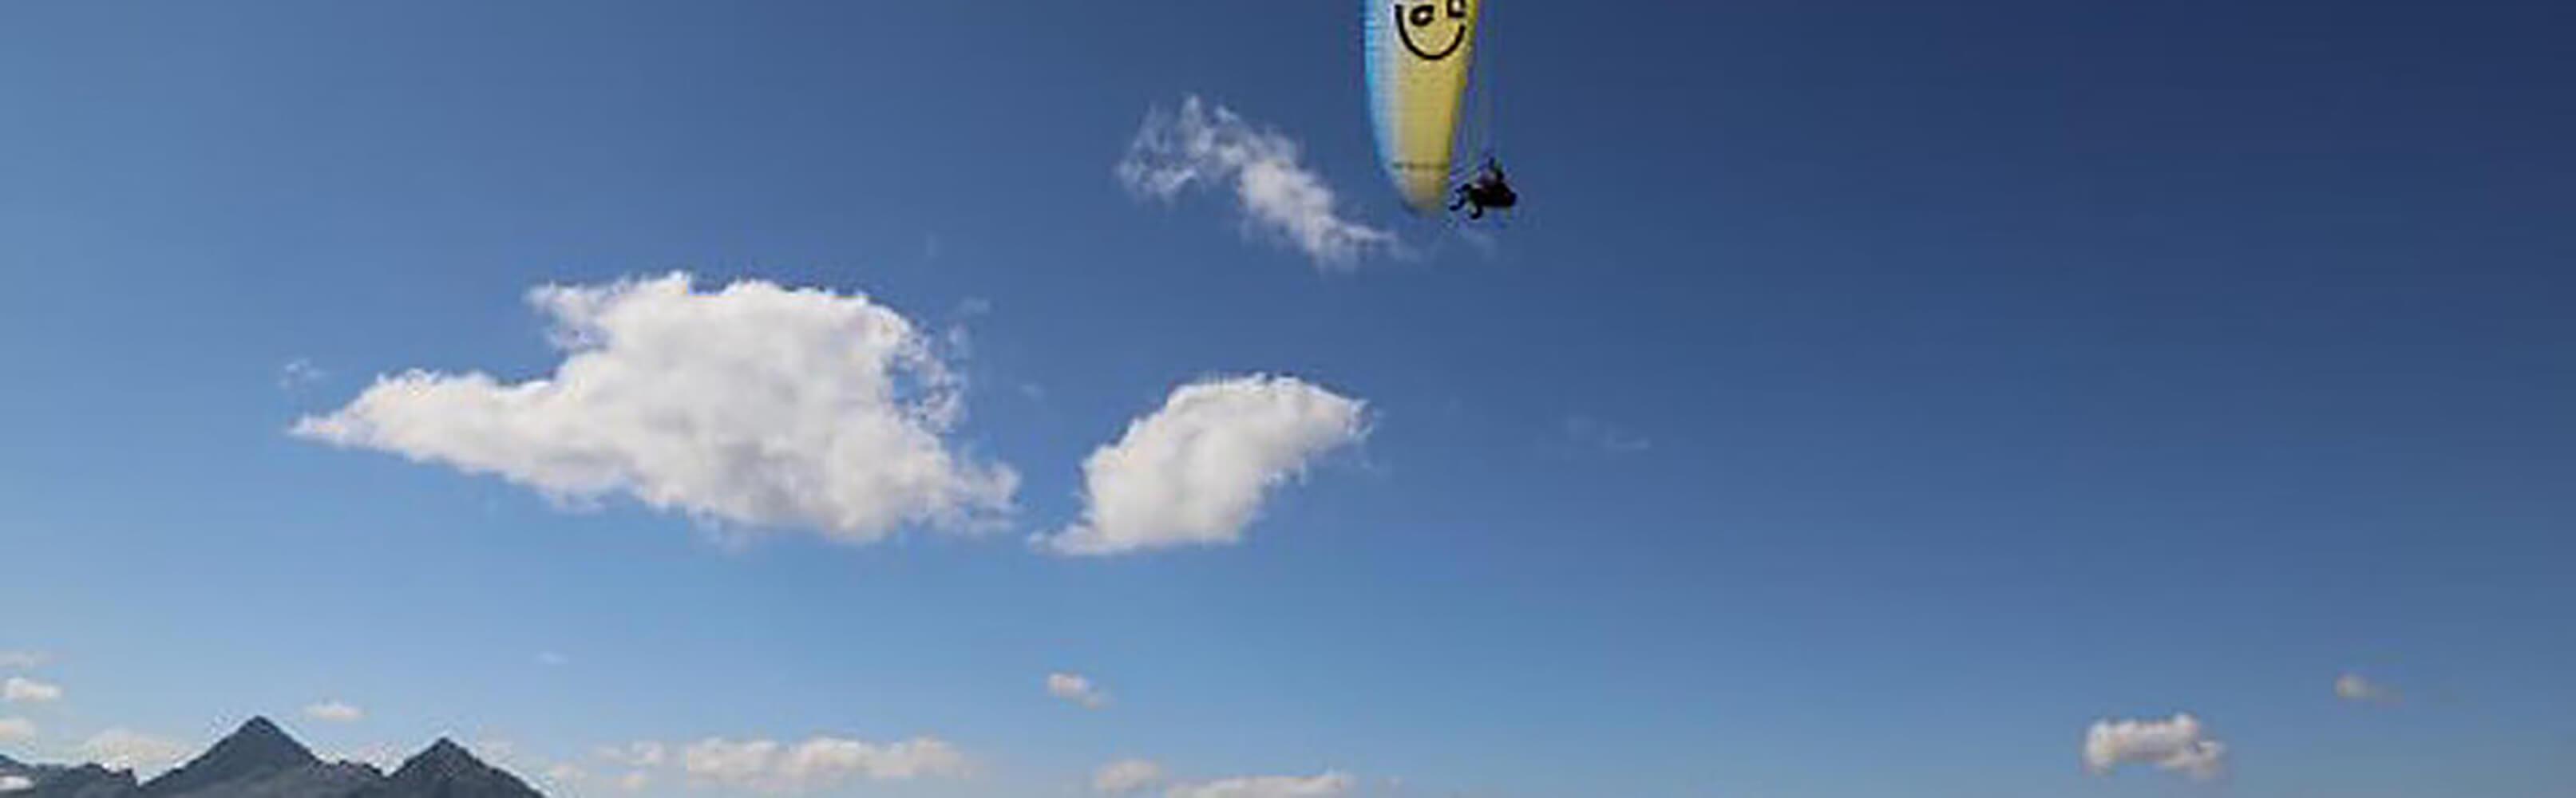 Air-Davos Paragliding 1